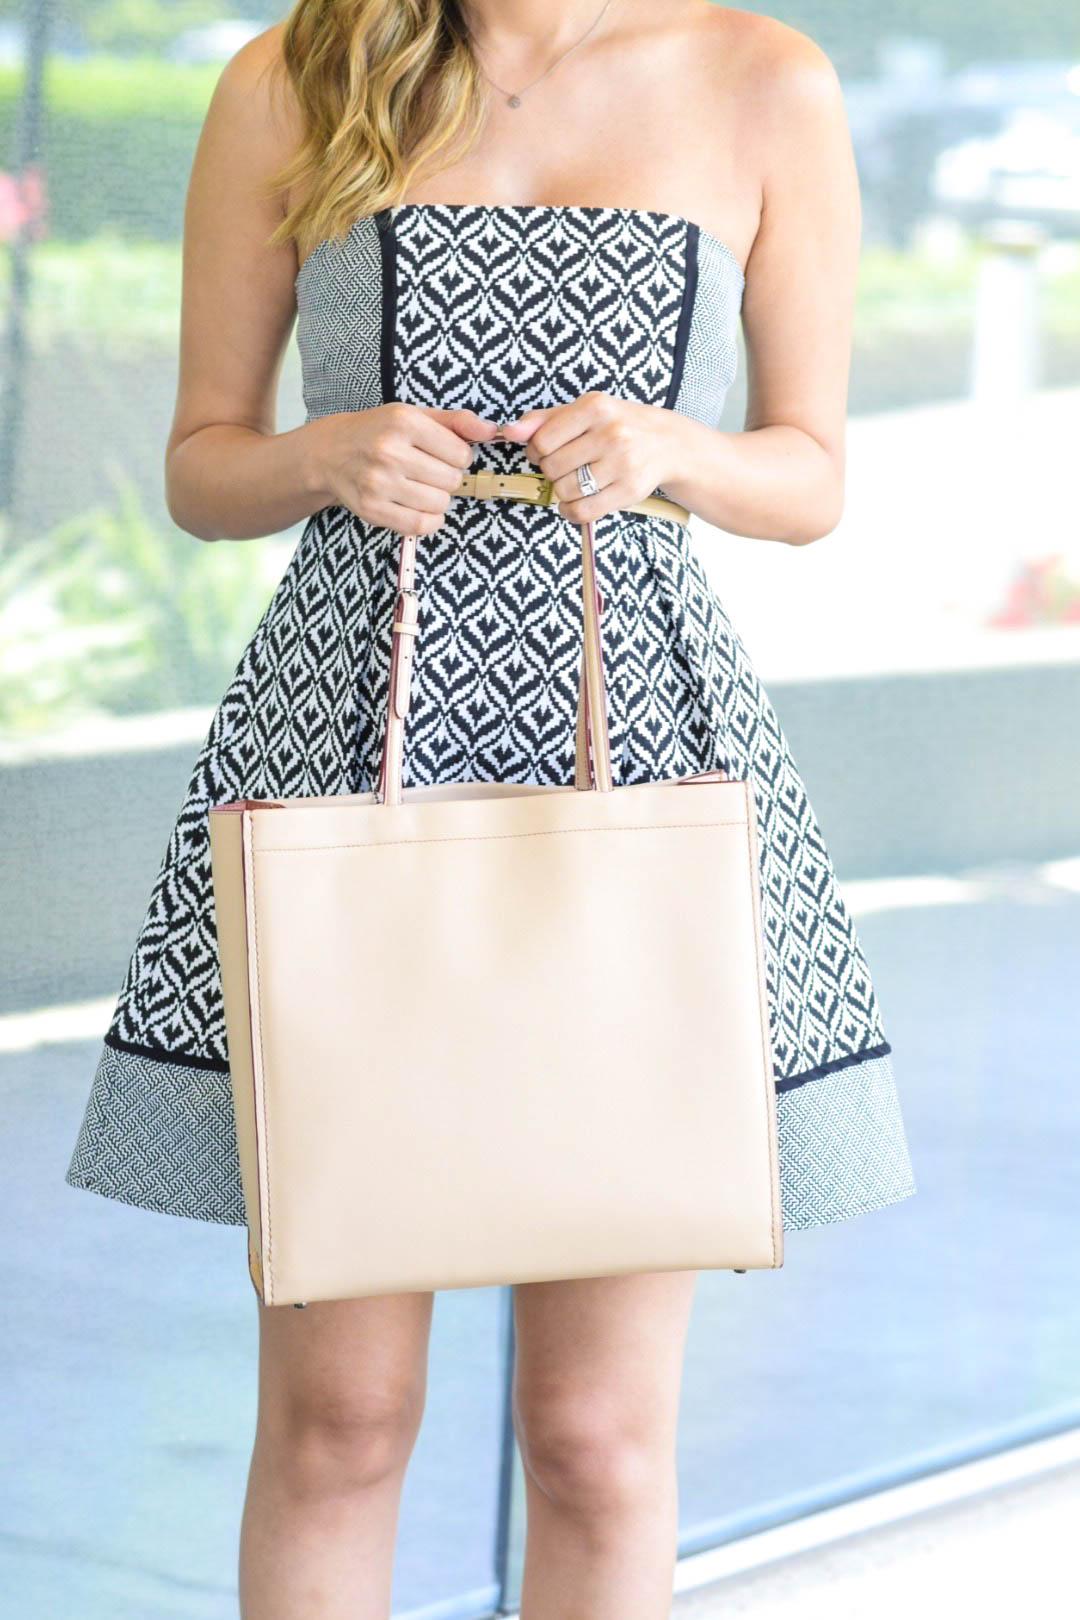 style the girl pattern dress 5